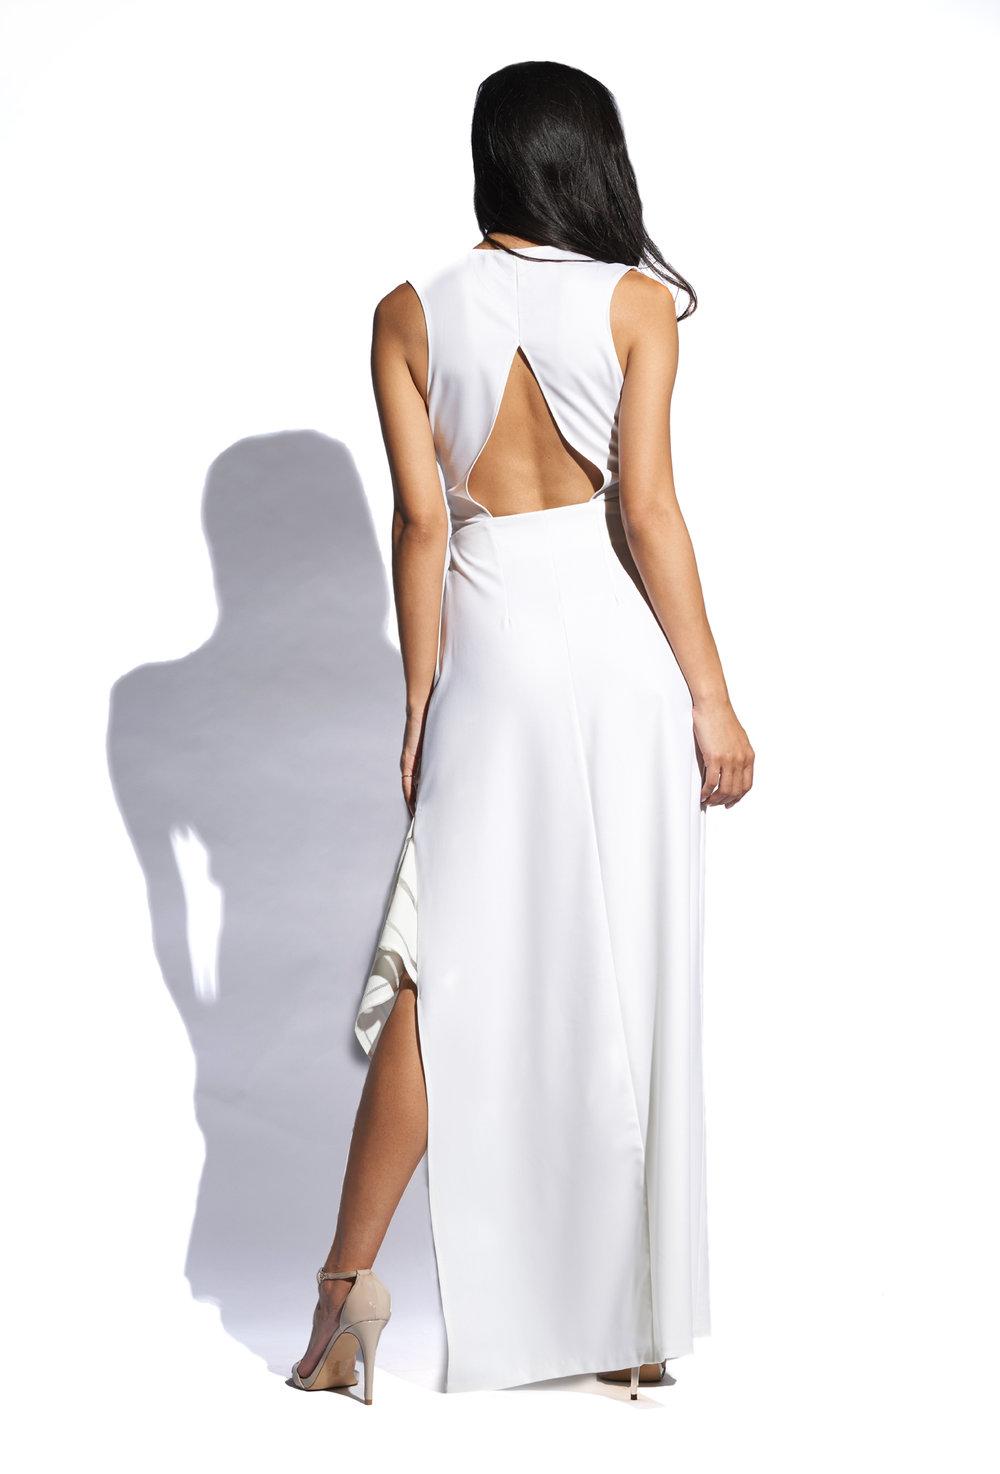 Stanwyck Dress (View 2)